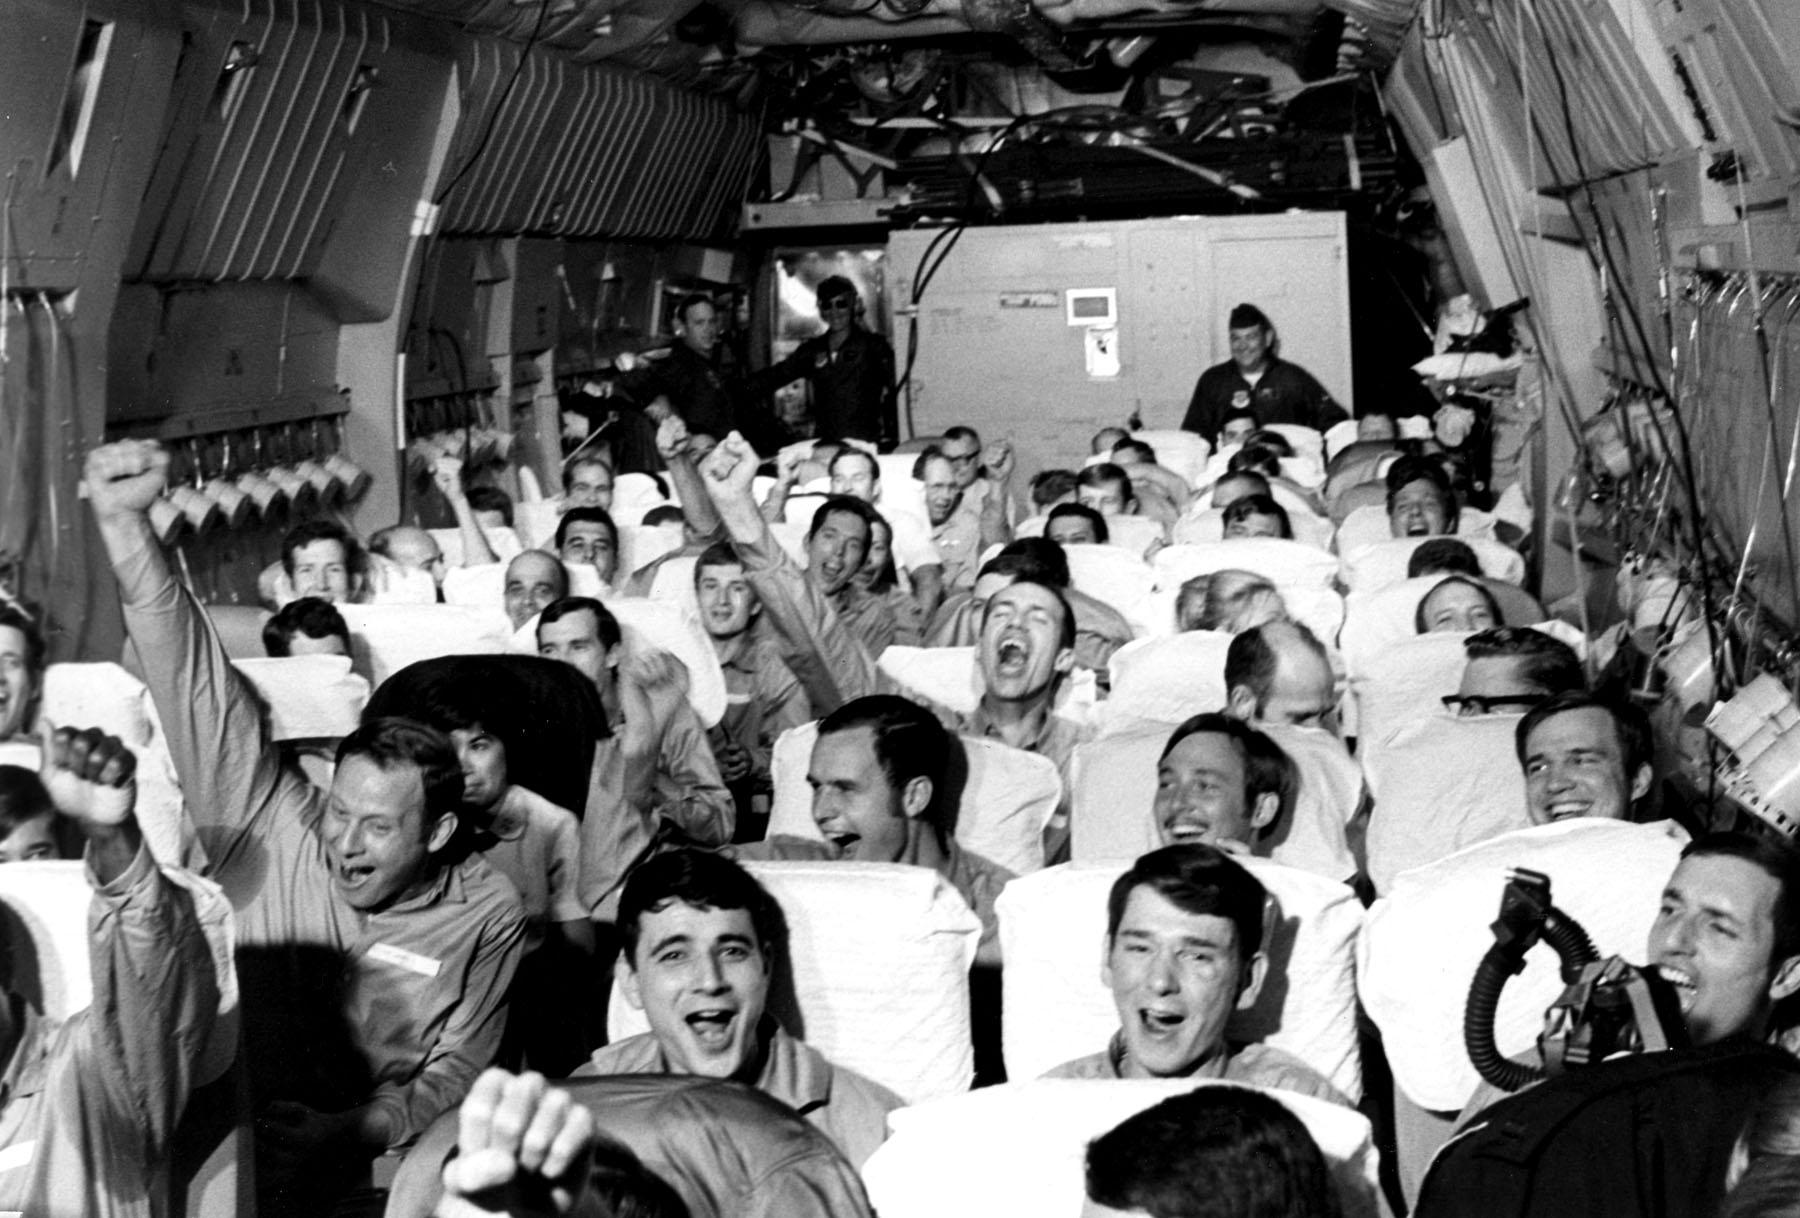 The Vietnam War Episode Ten The Weight Of Memory March 1973